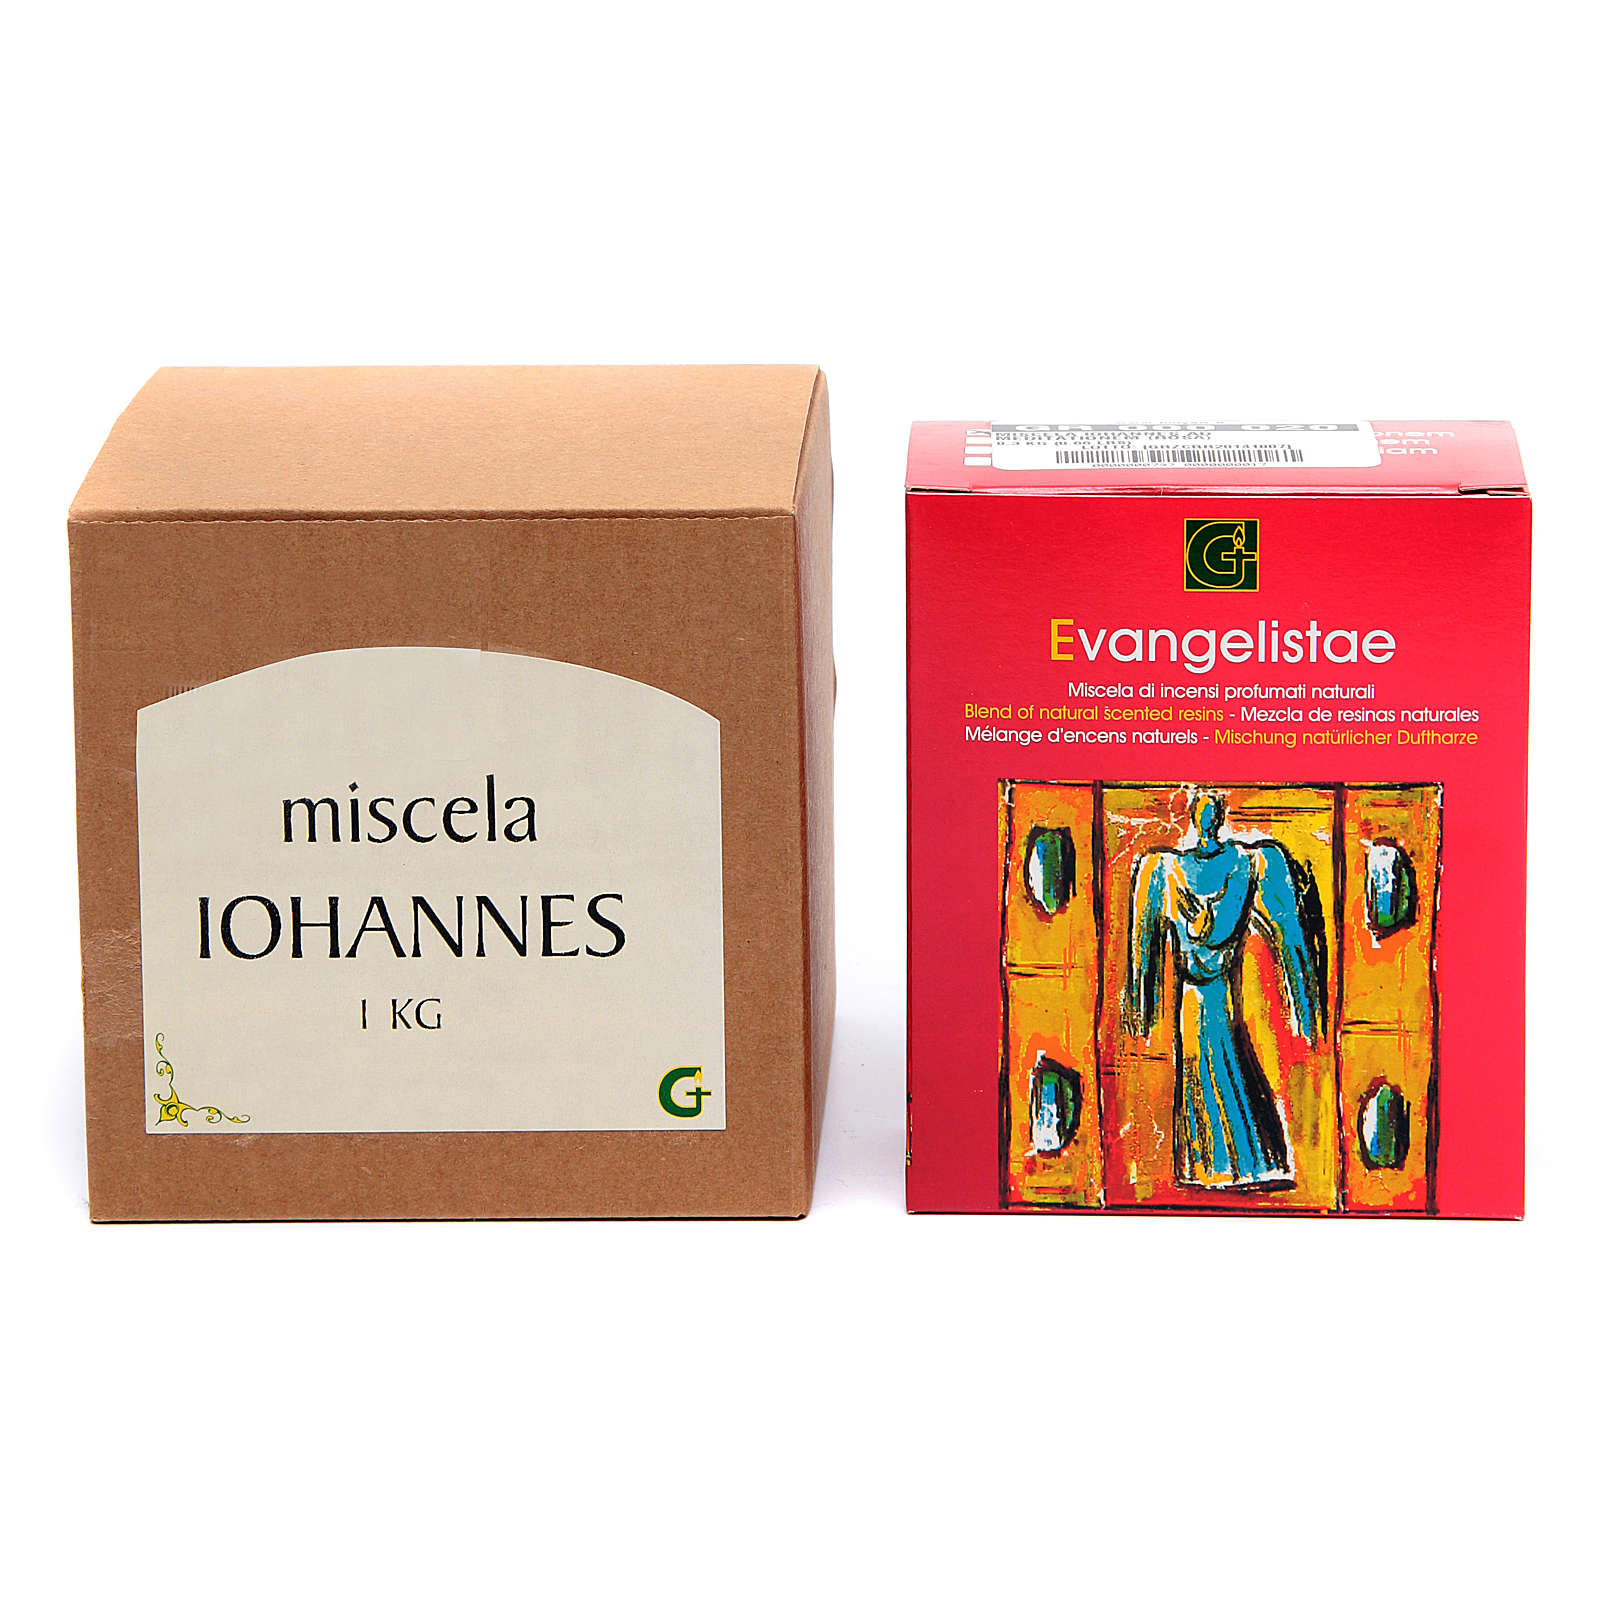 Iohannes ad meditationem incense mix (rose) 3